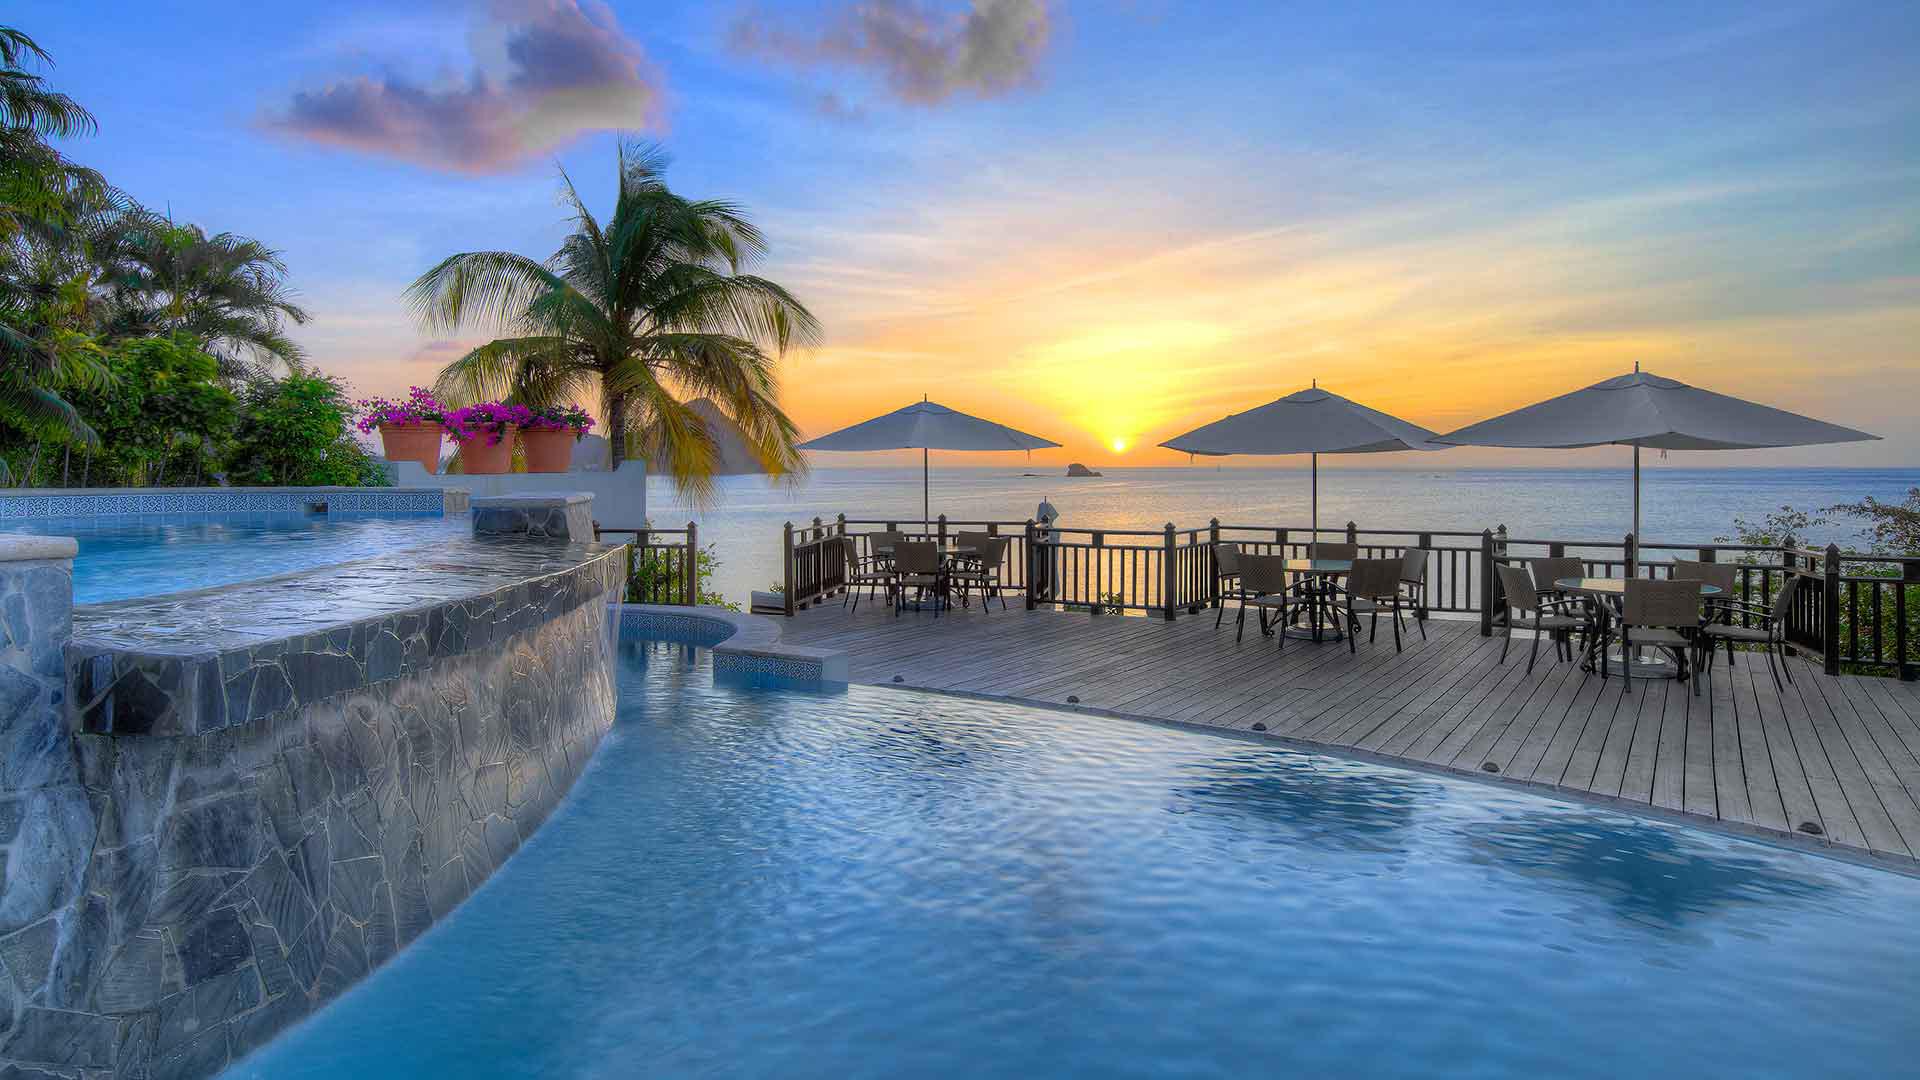 St Lucia Luxury Travel